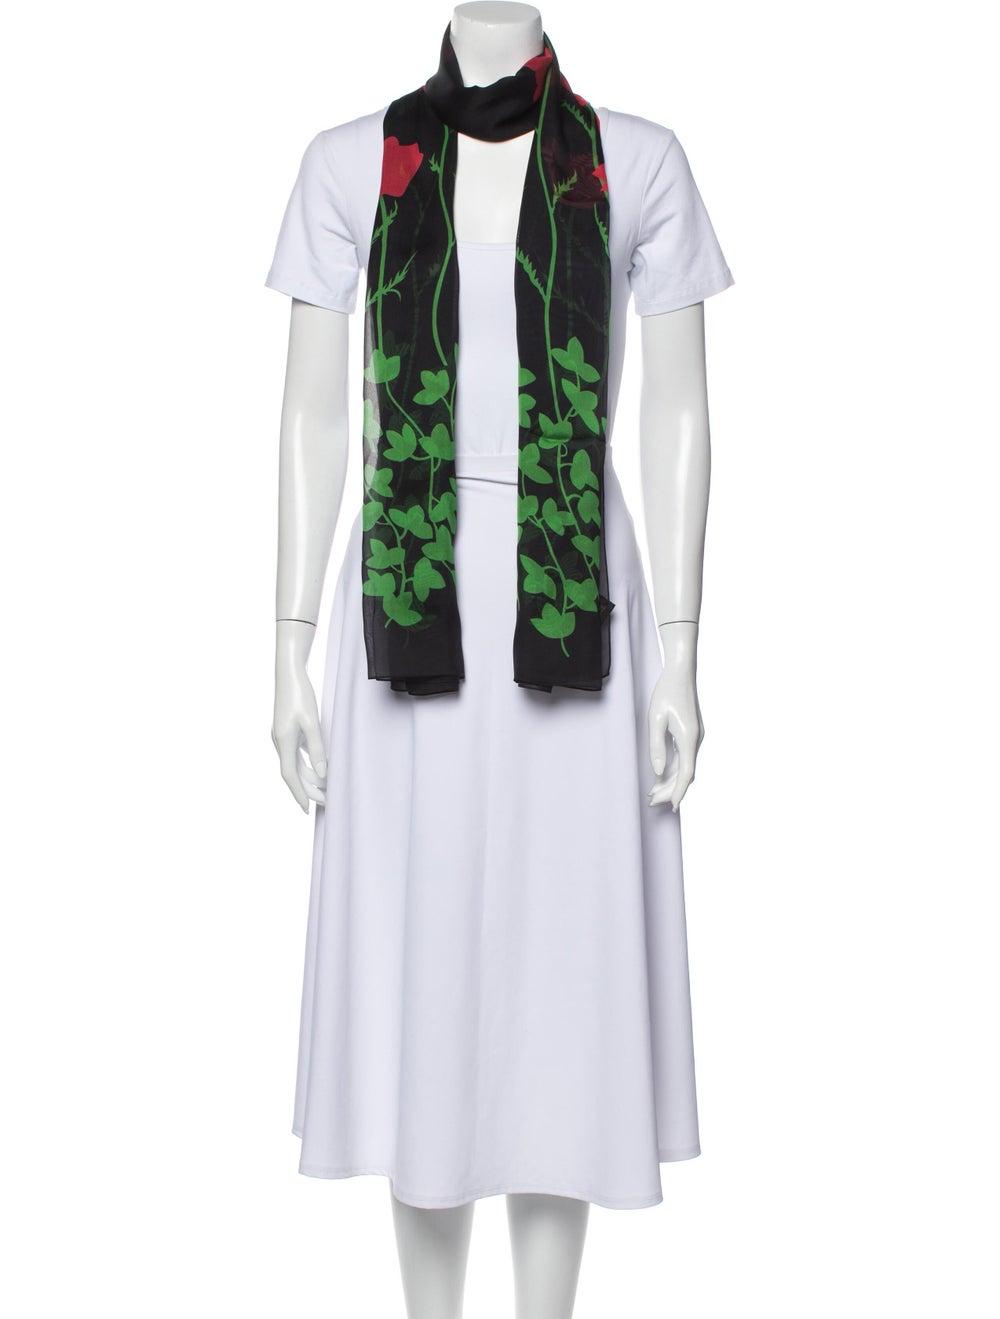 Gucci Silk Floral Print Scarf Black - image 3